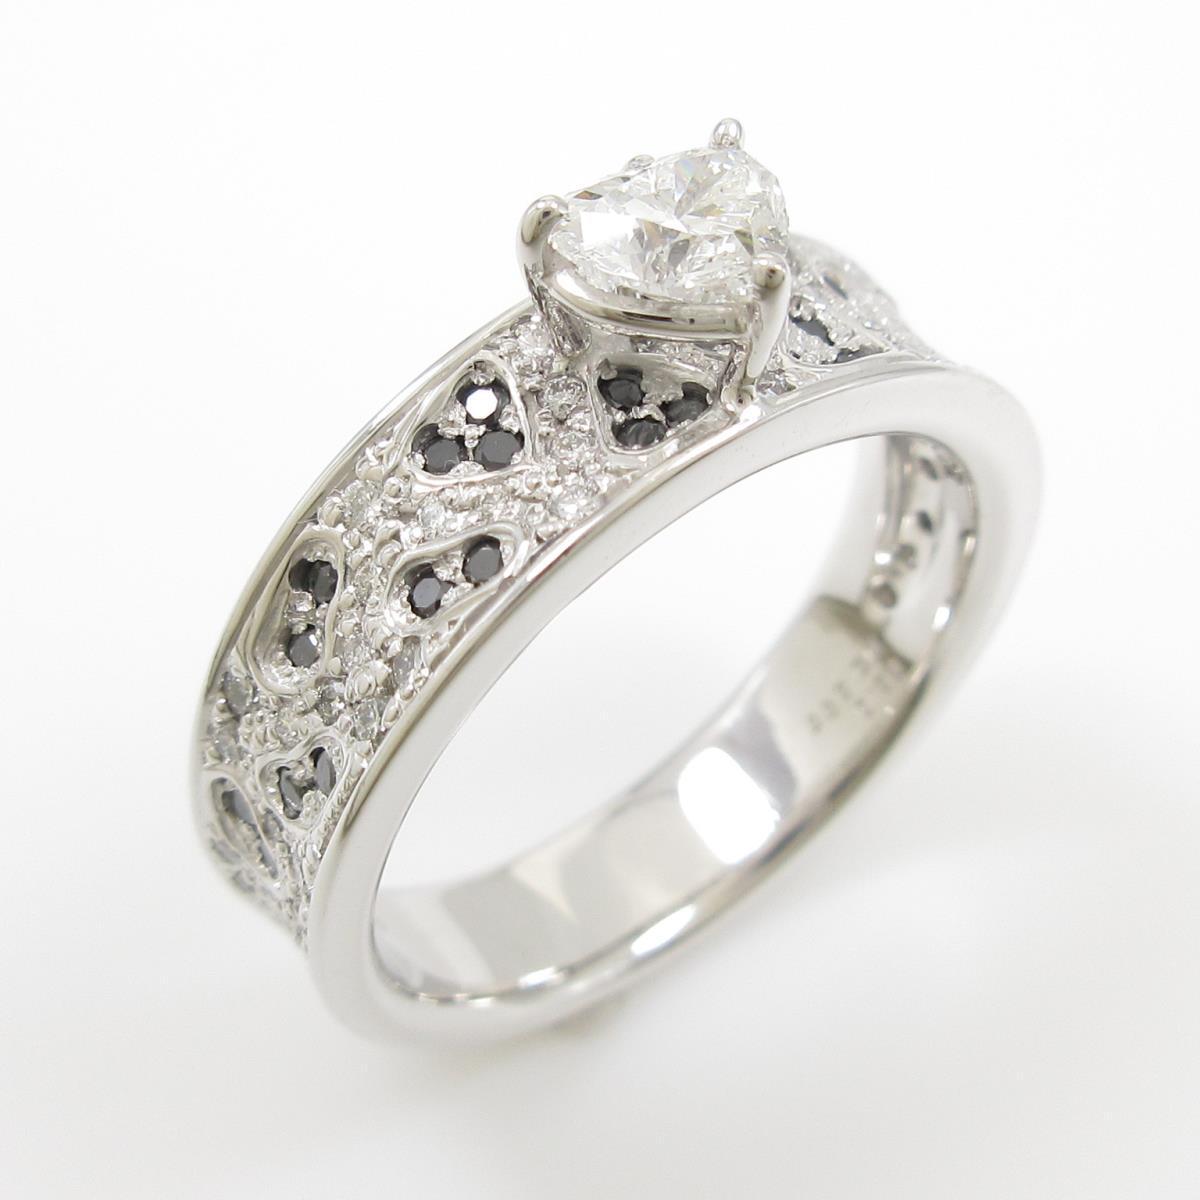 K18WG ダイヤモンドリング 0.385ct・E・VS2・ハートシェイプ【中古】